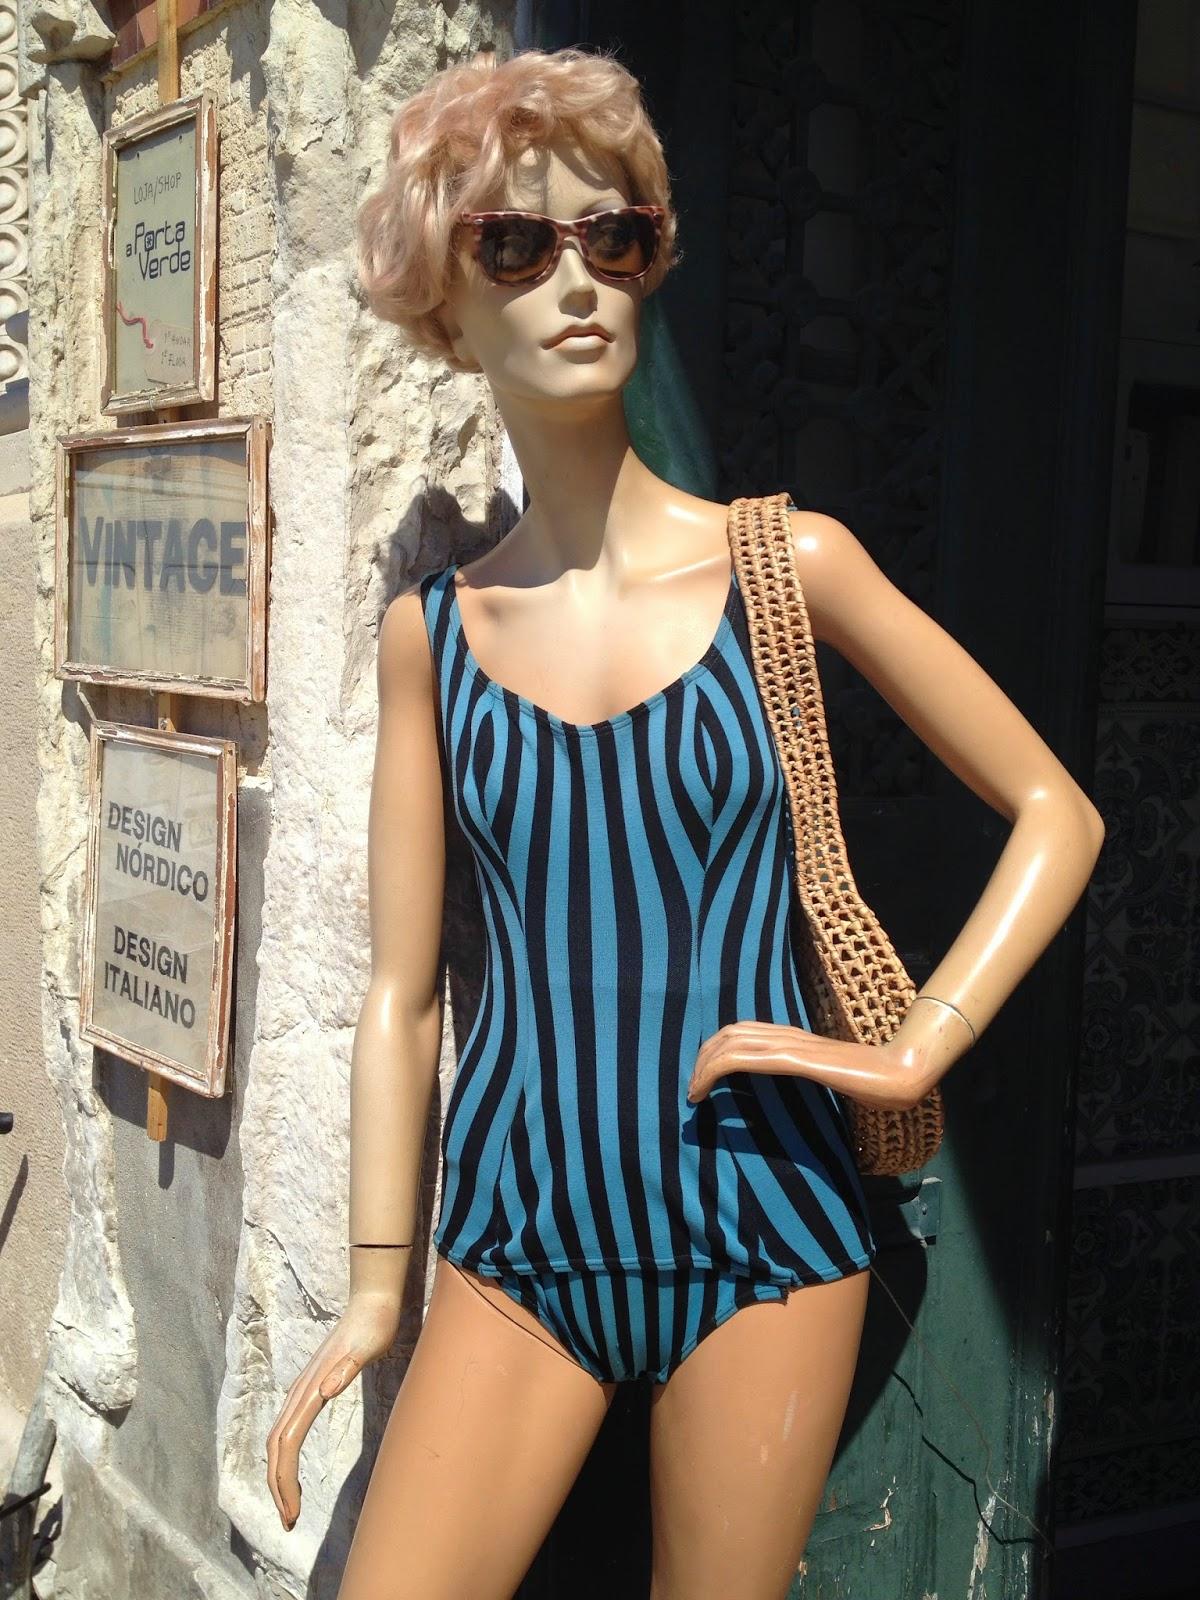 summer, verão, vintage, vintage shop, tienda vintage, loja vintage, aveiro